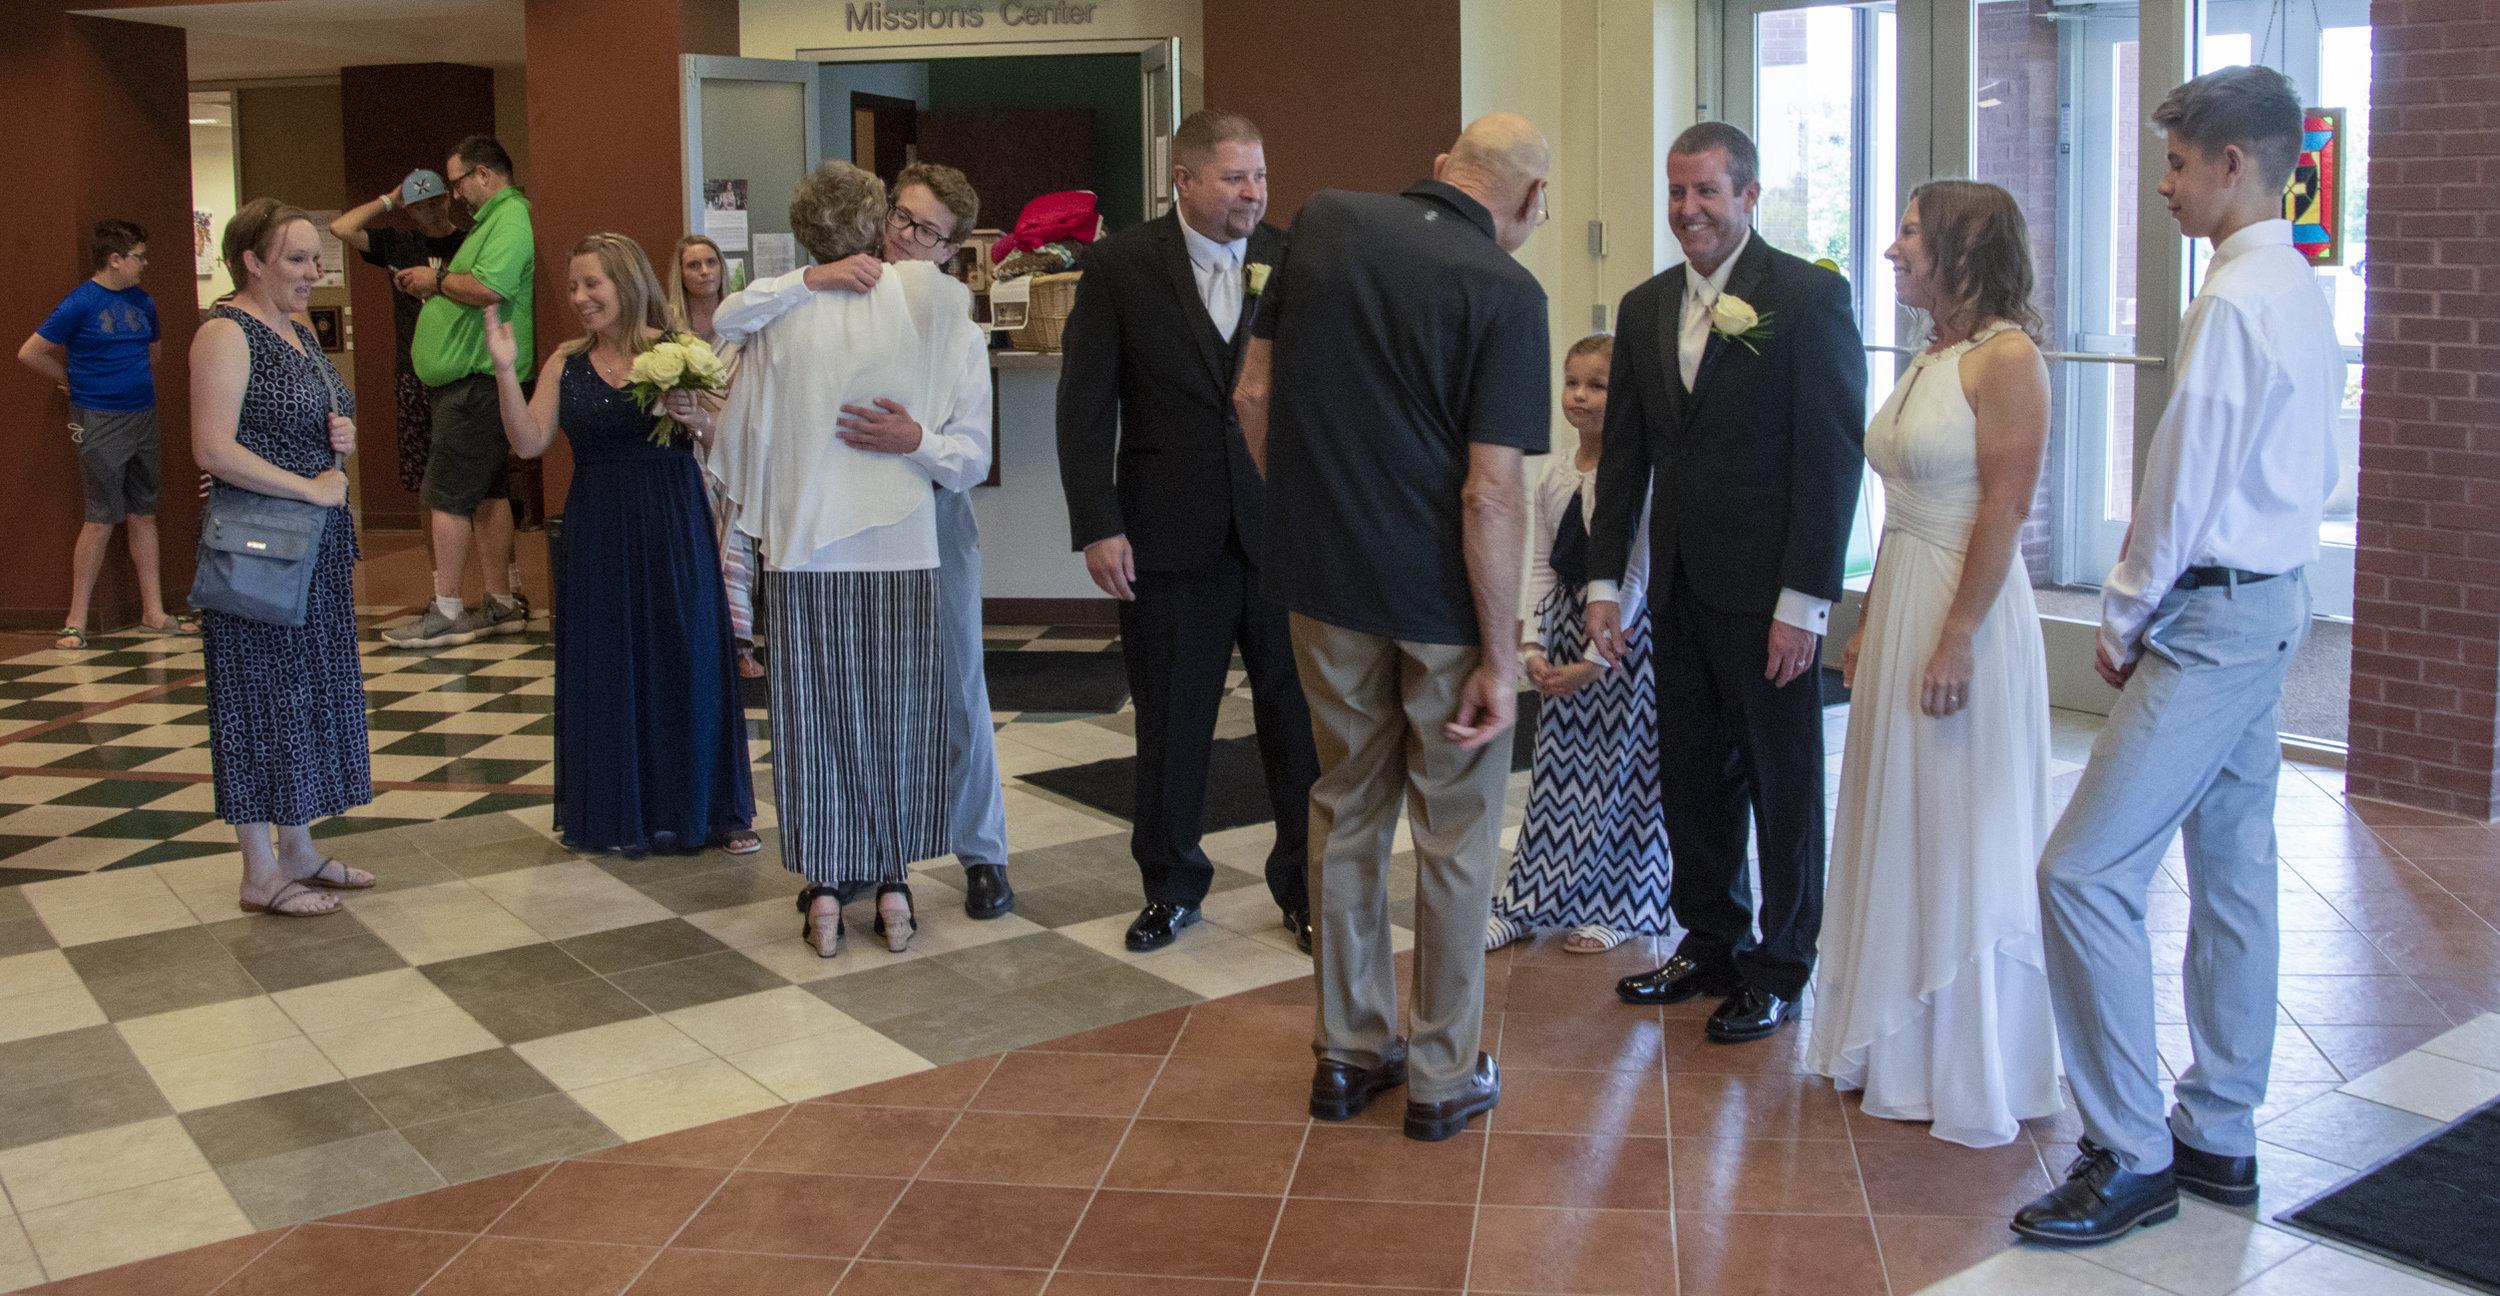 cylekristinwedding (25 of 47).jpg